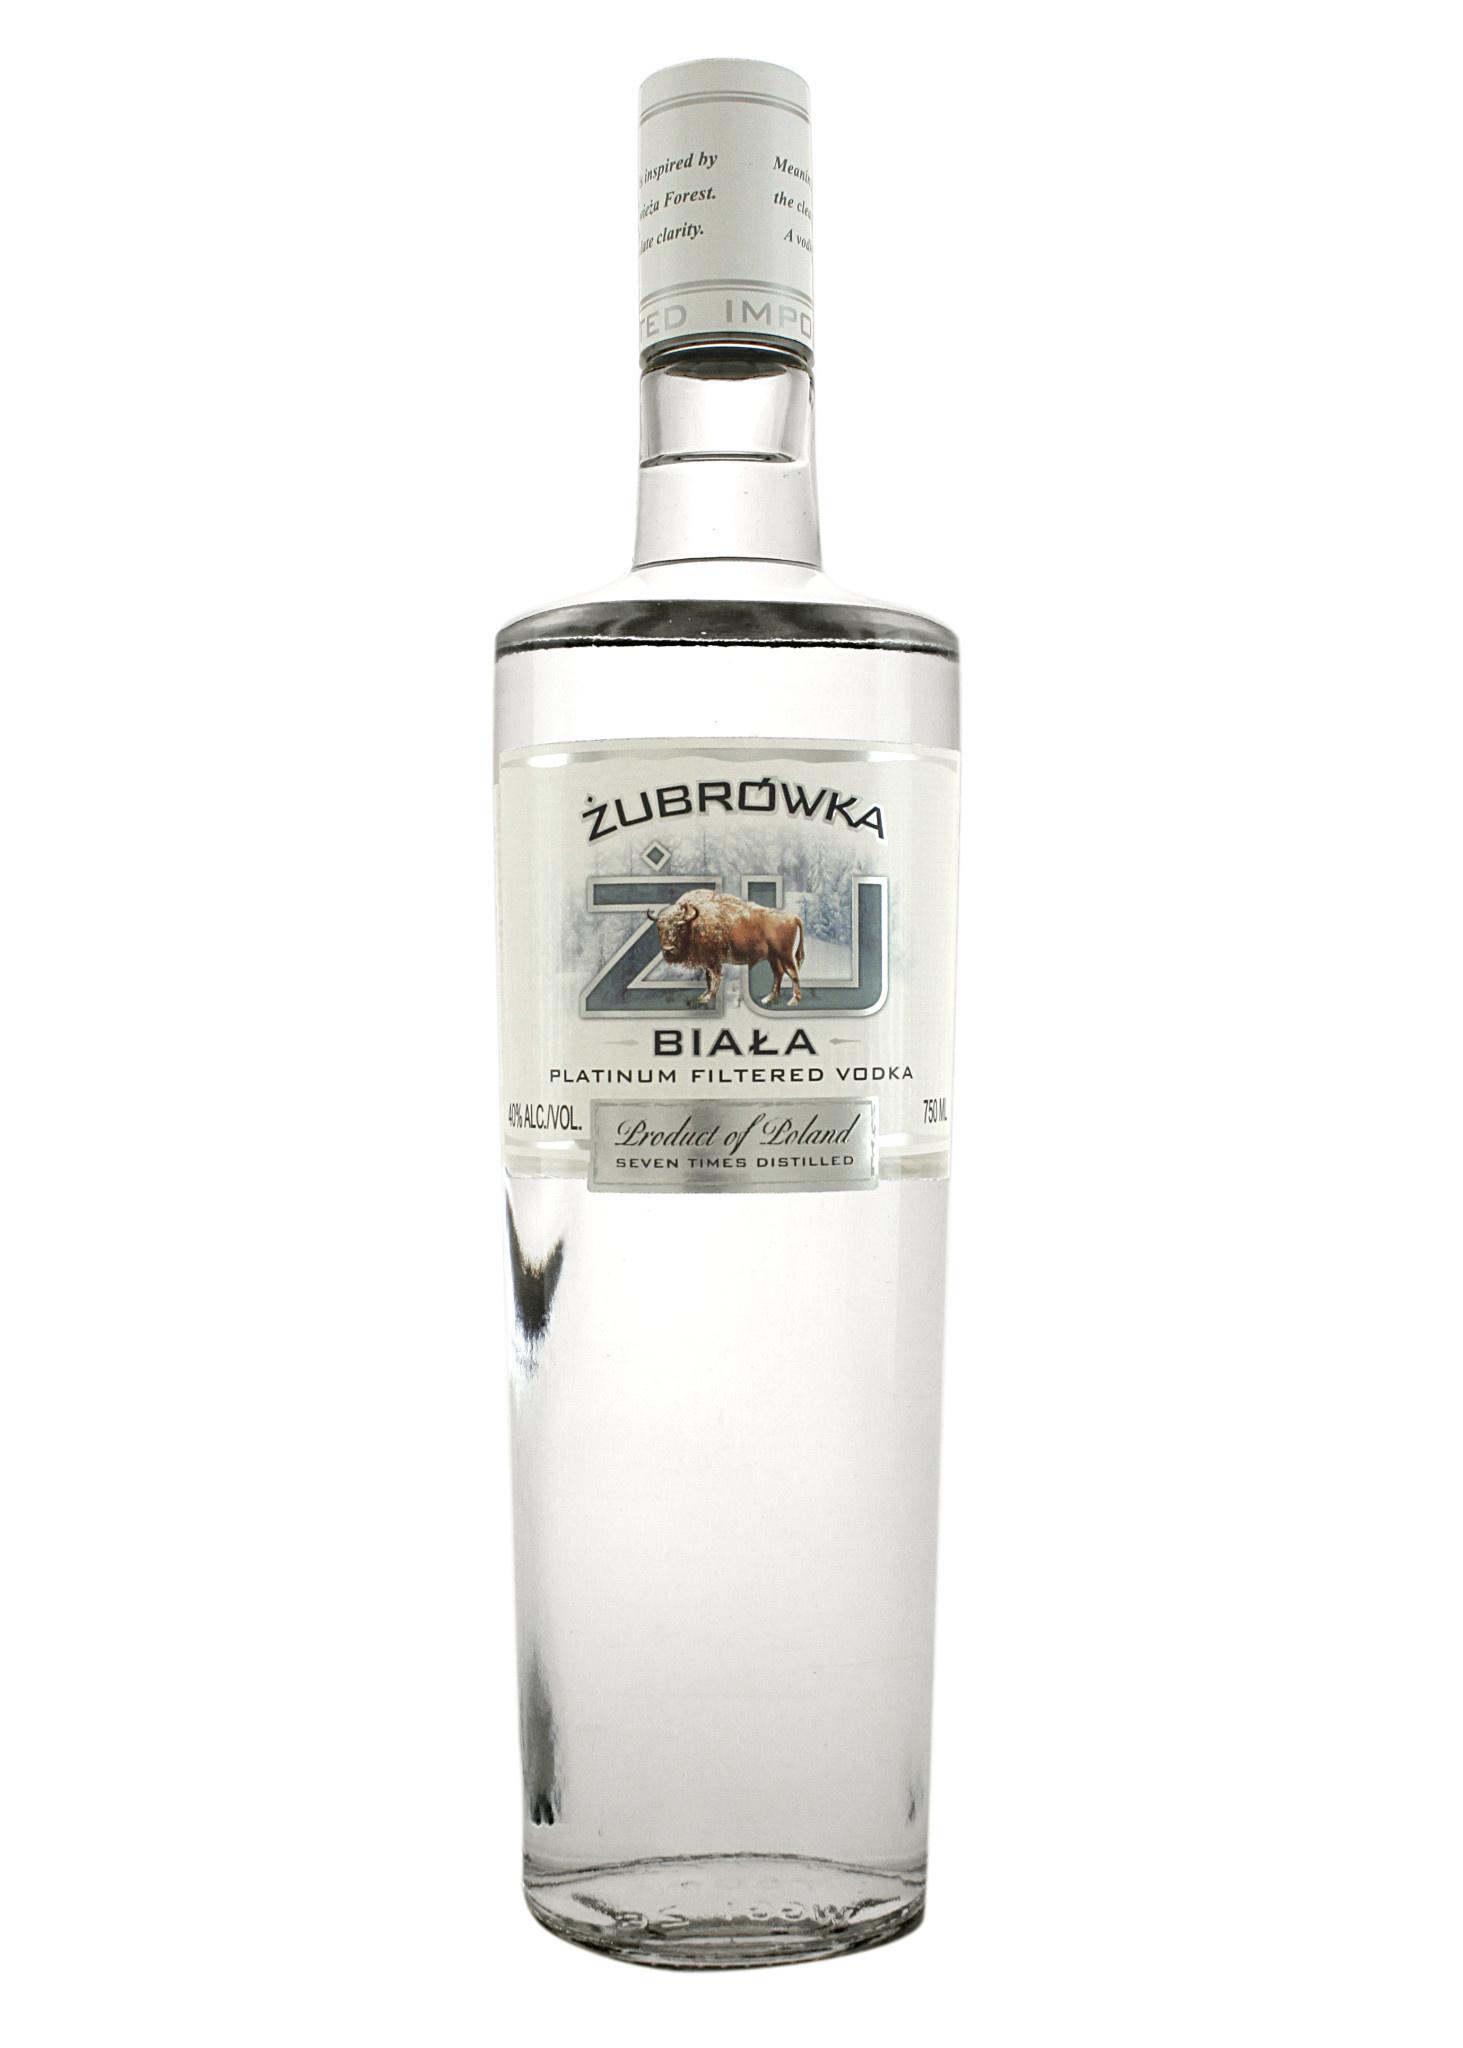 Zubrowka Biala Winter Rye Vodka, Poland